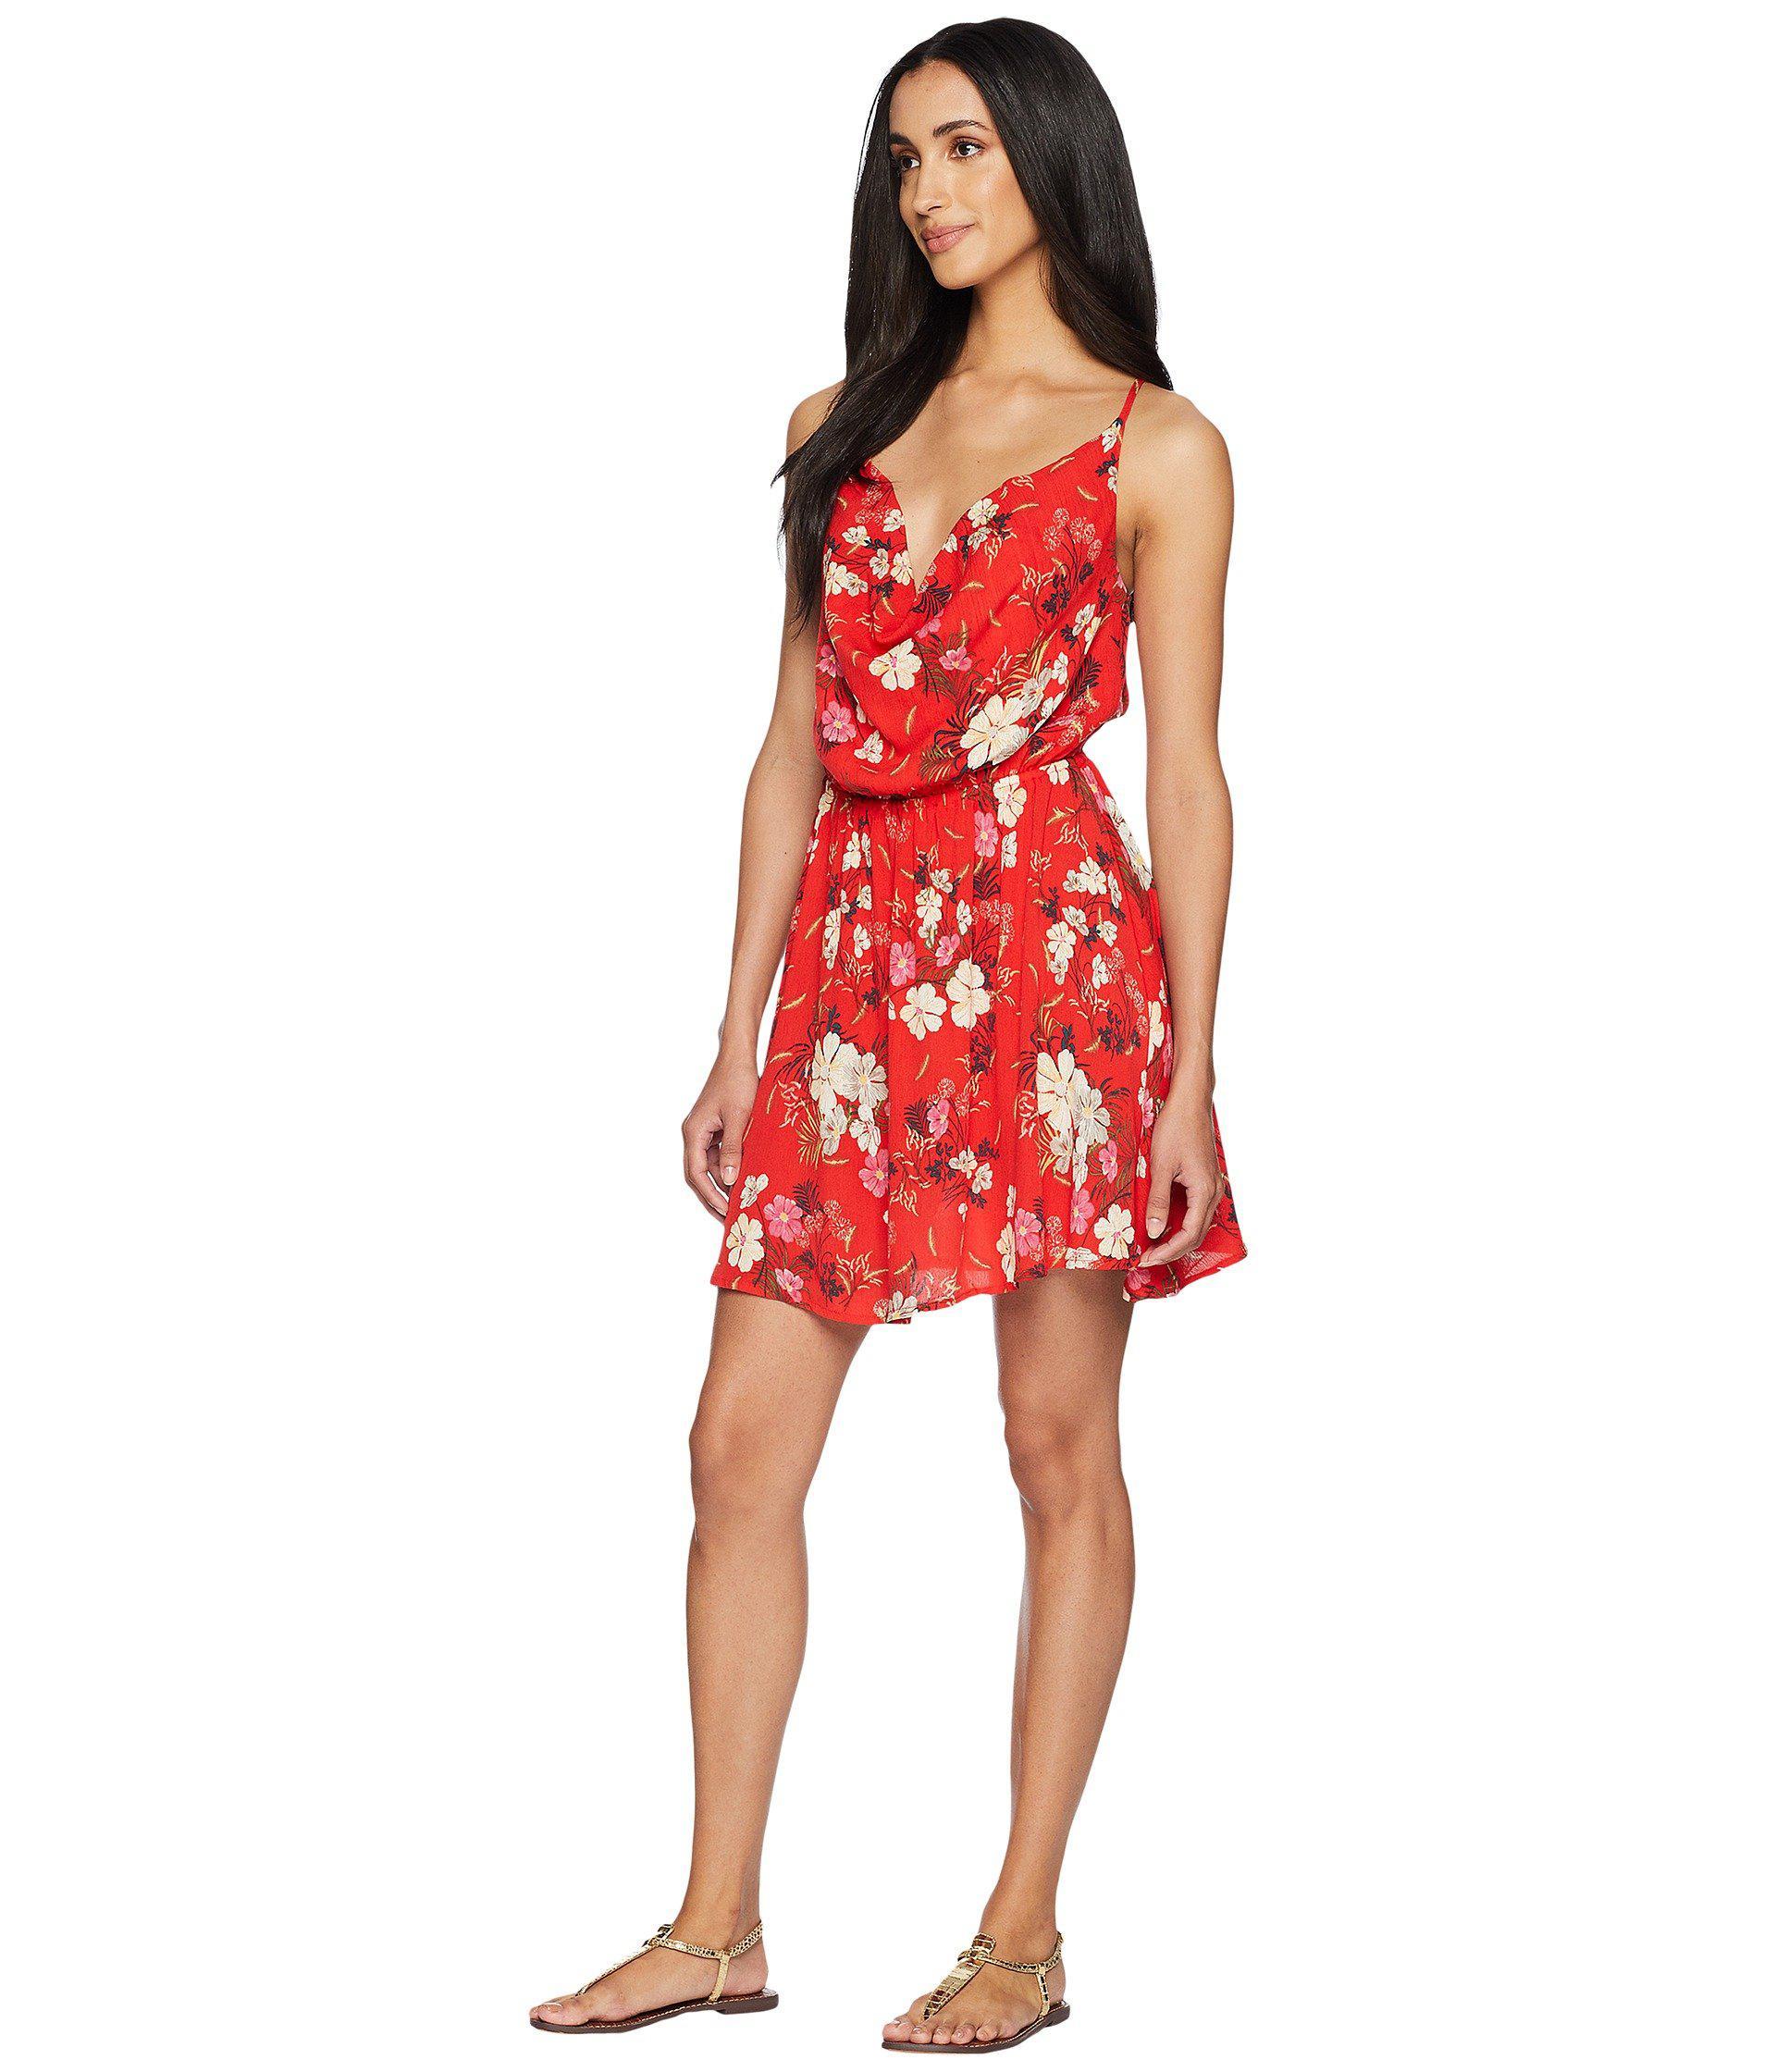 2266b325f55c7 Lyst - O neill Sportswear Ashby Dress in Red - Save 22%